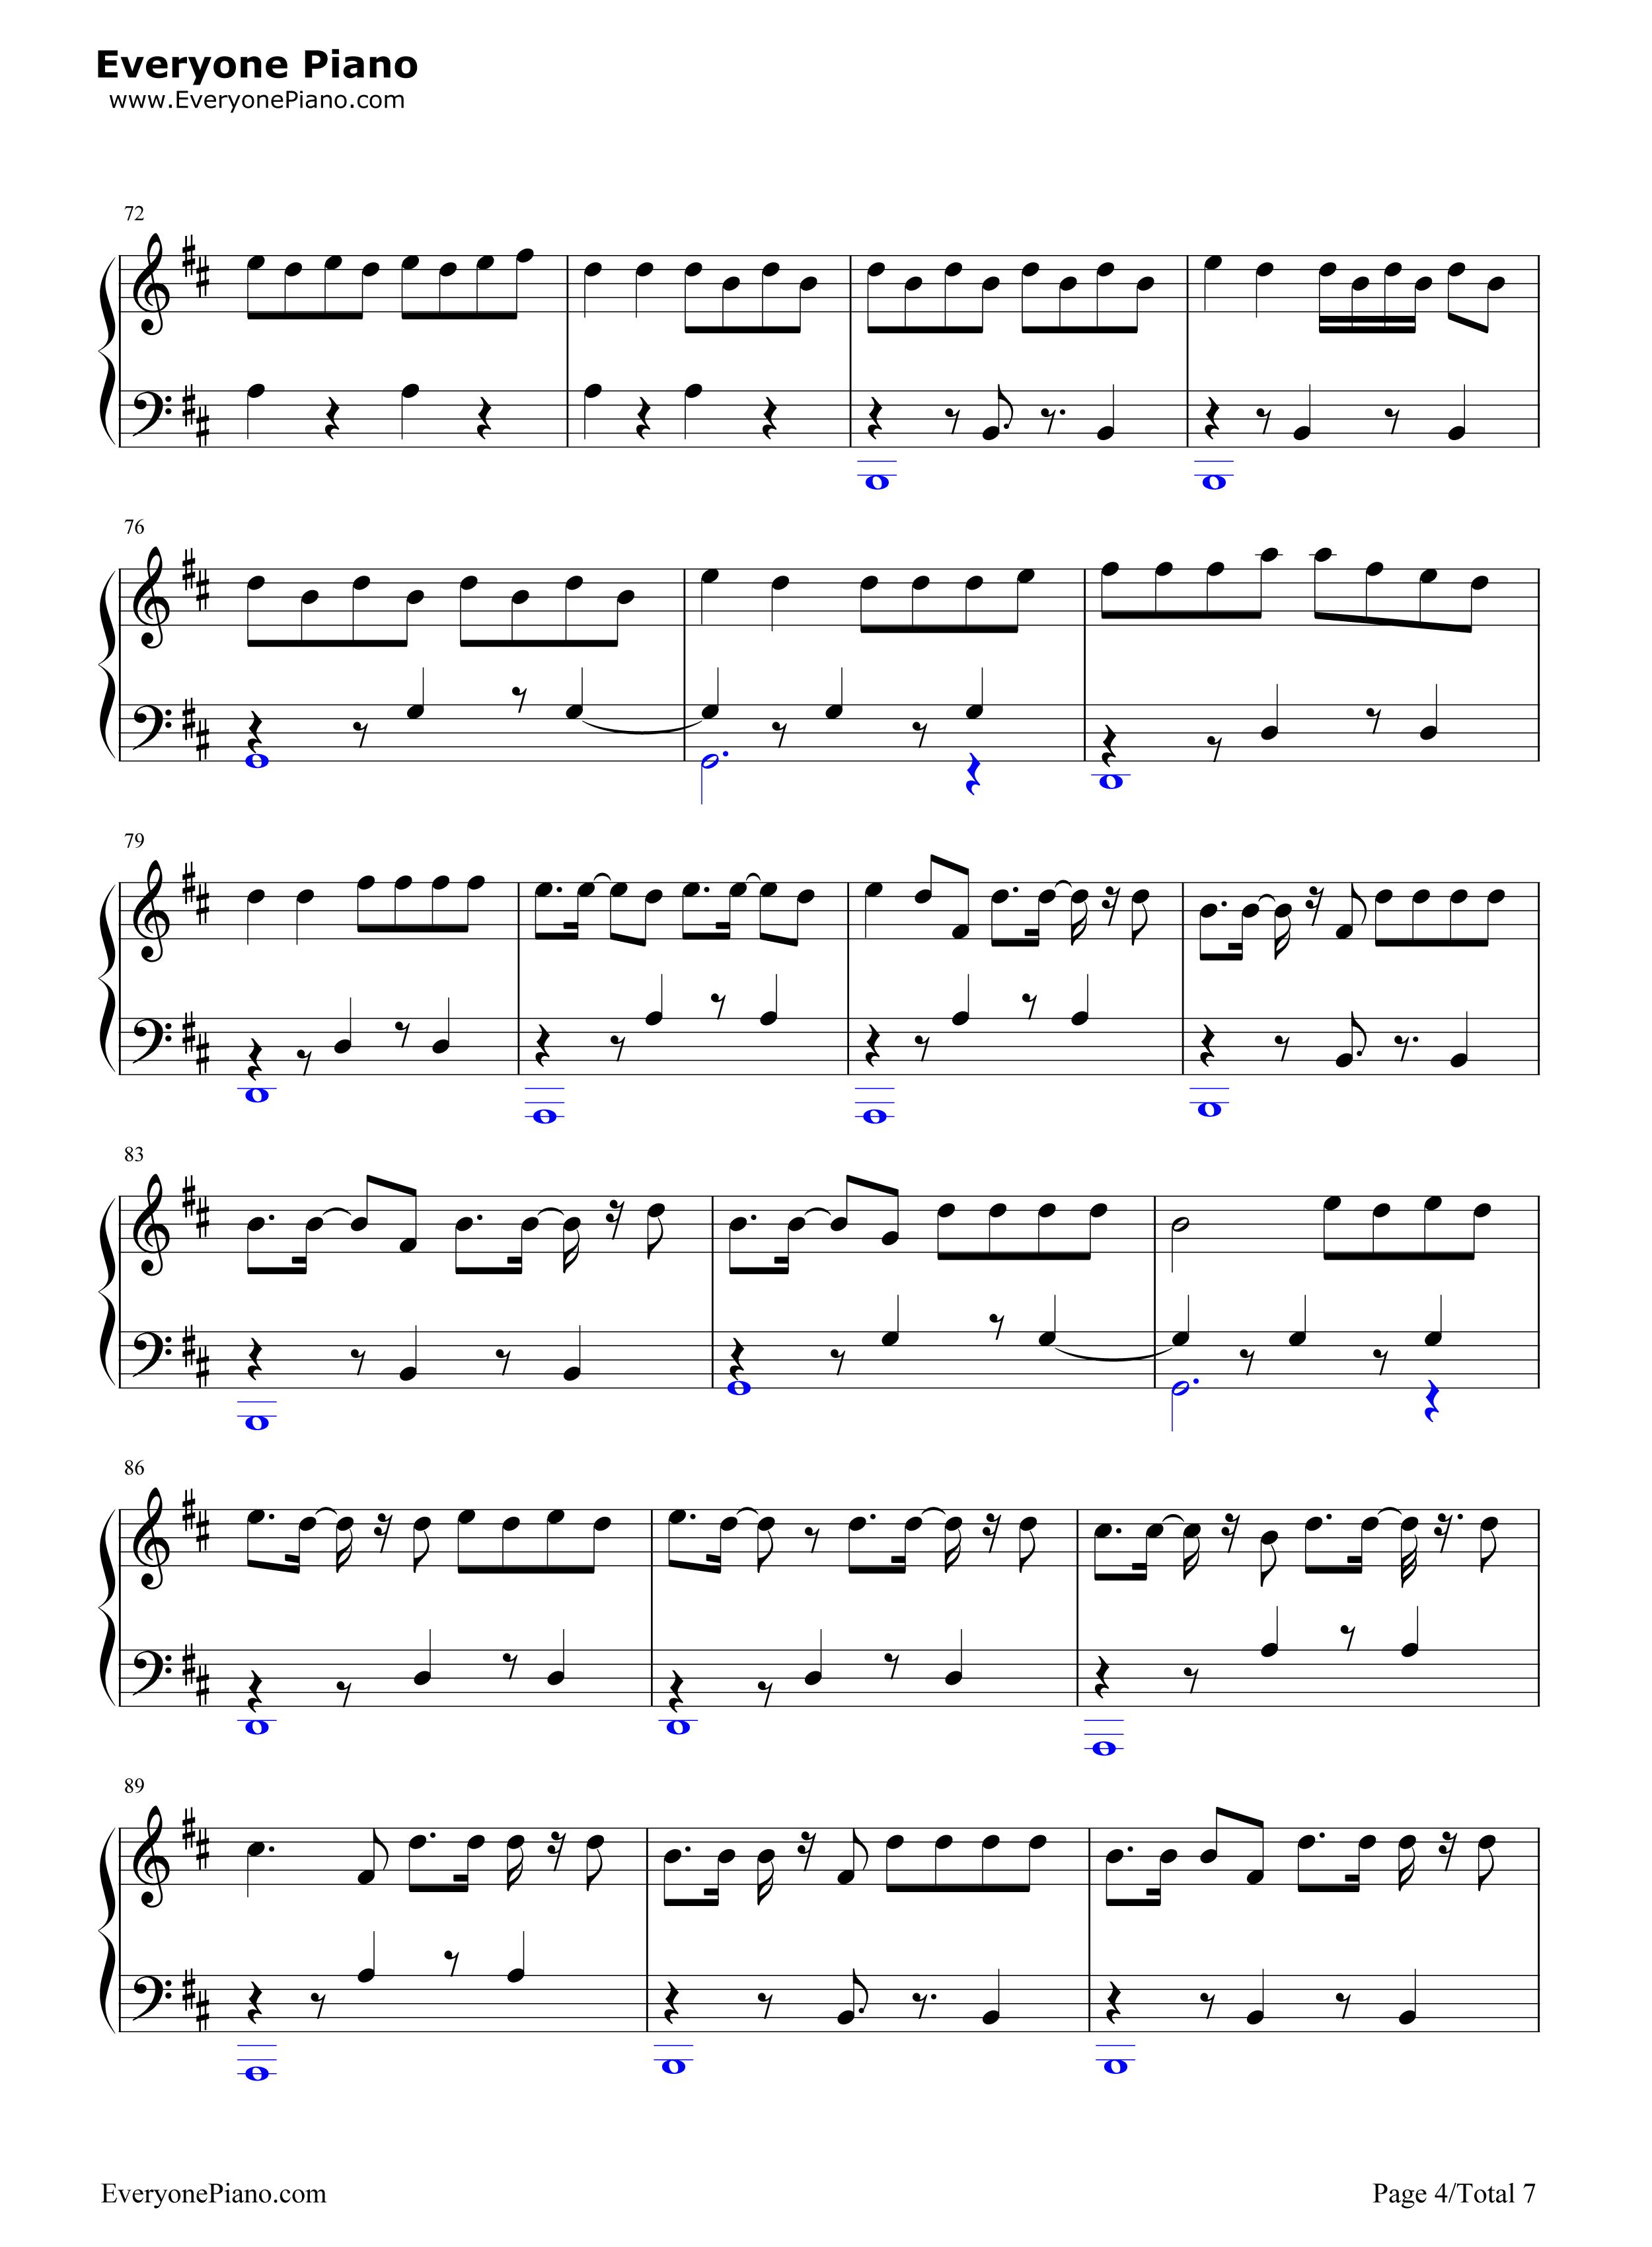 despacito简单版-luis fonsi五线谱预览4